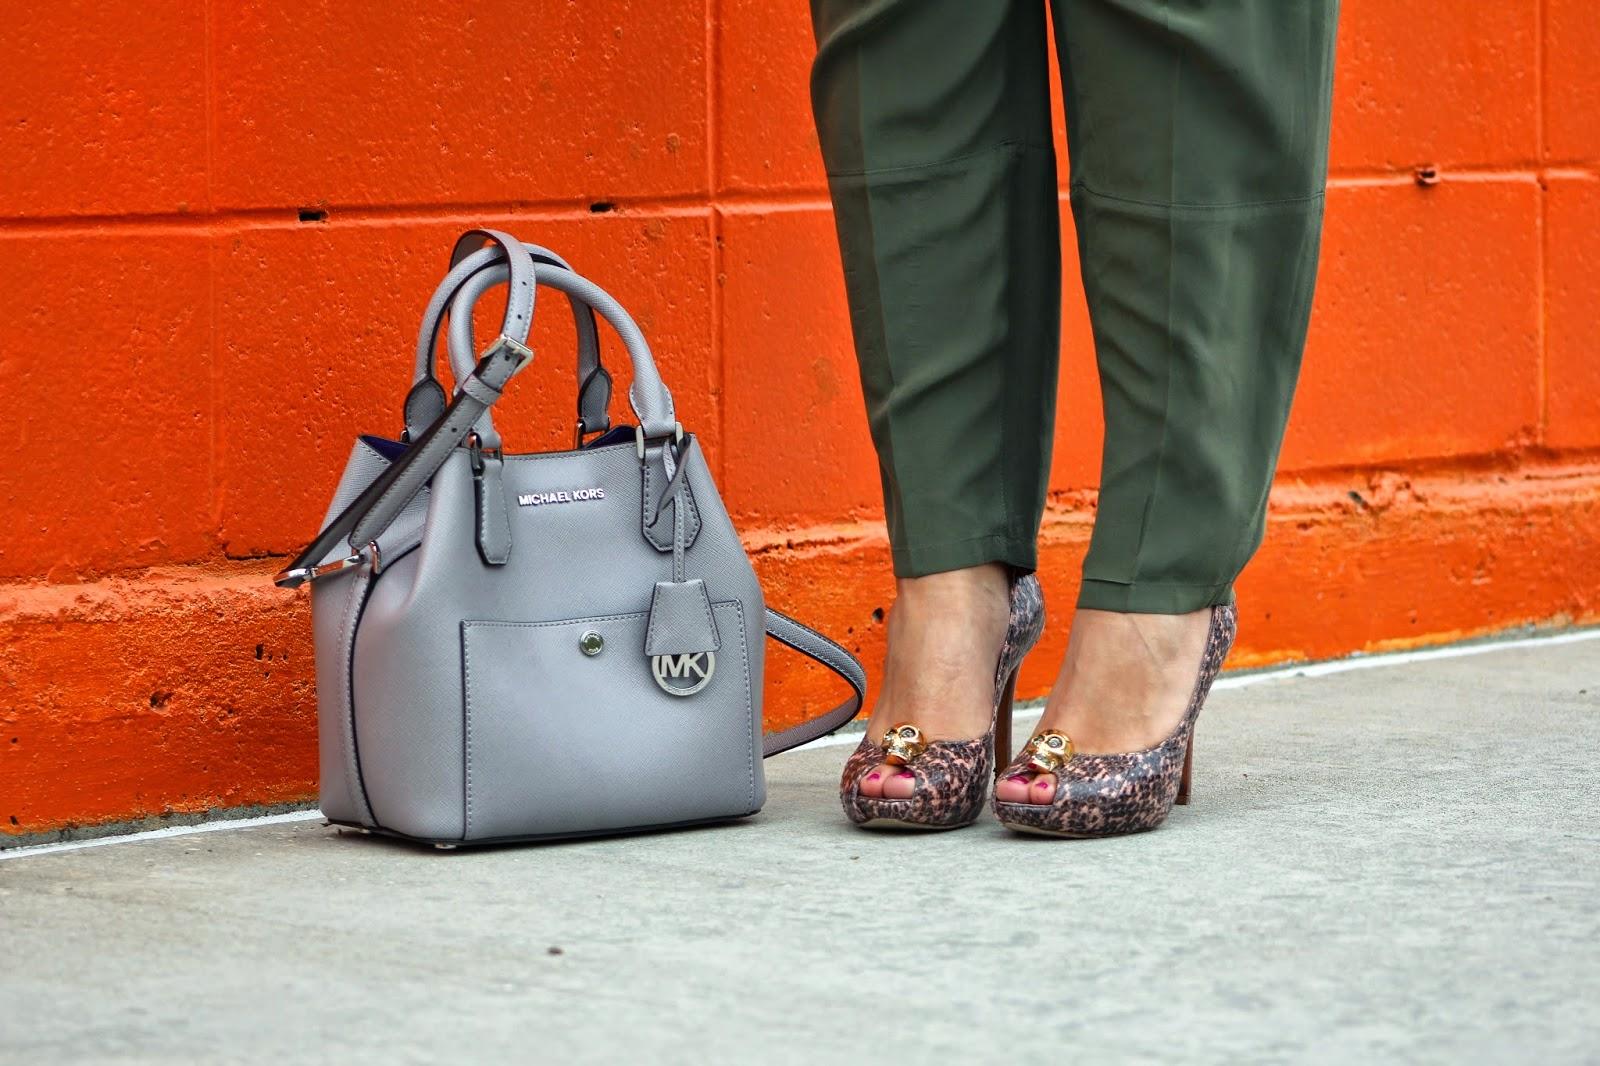 michael kors greenwish purse